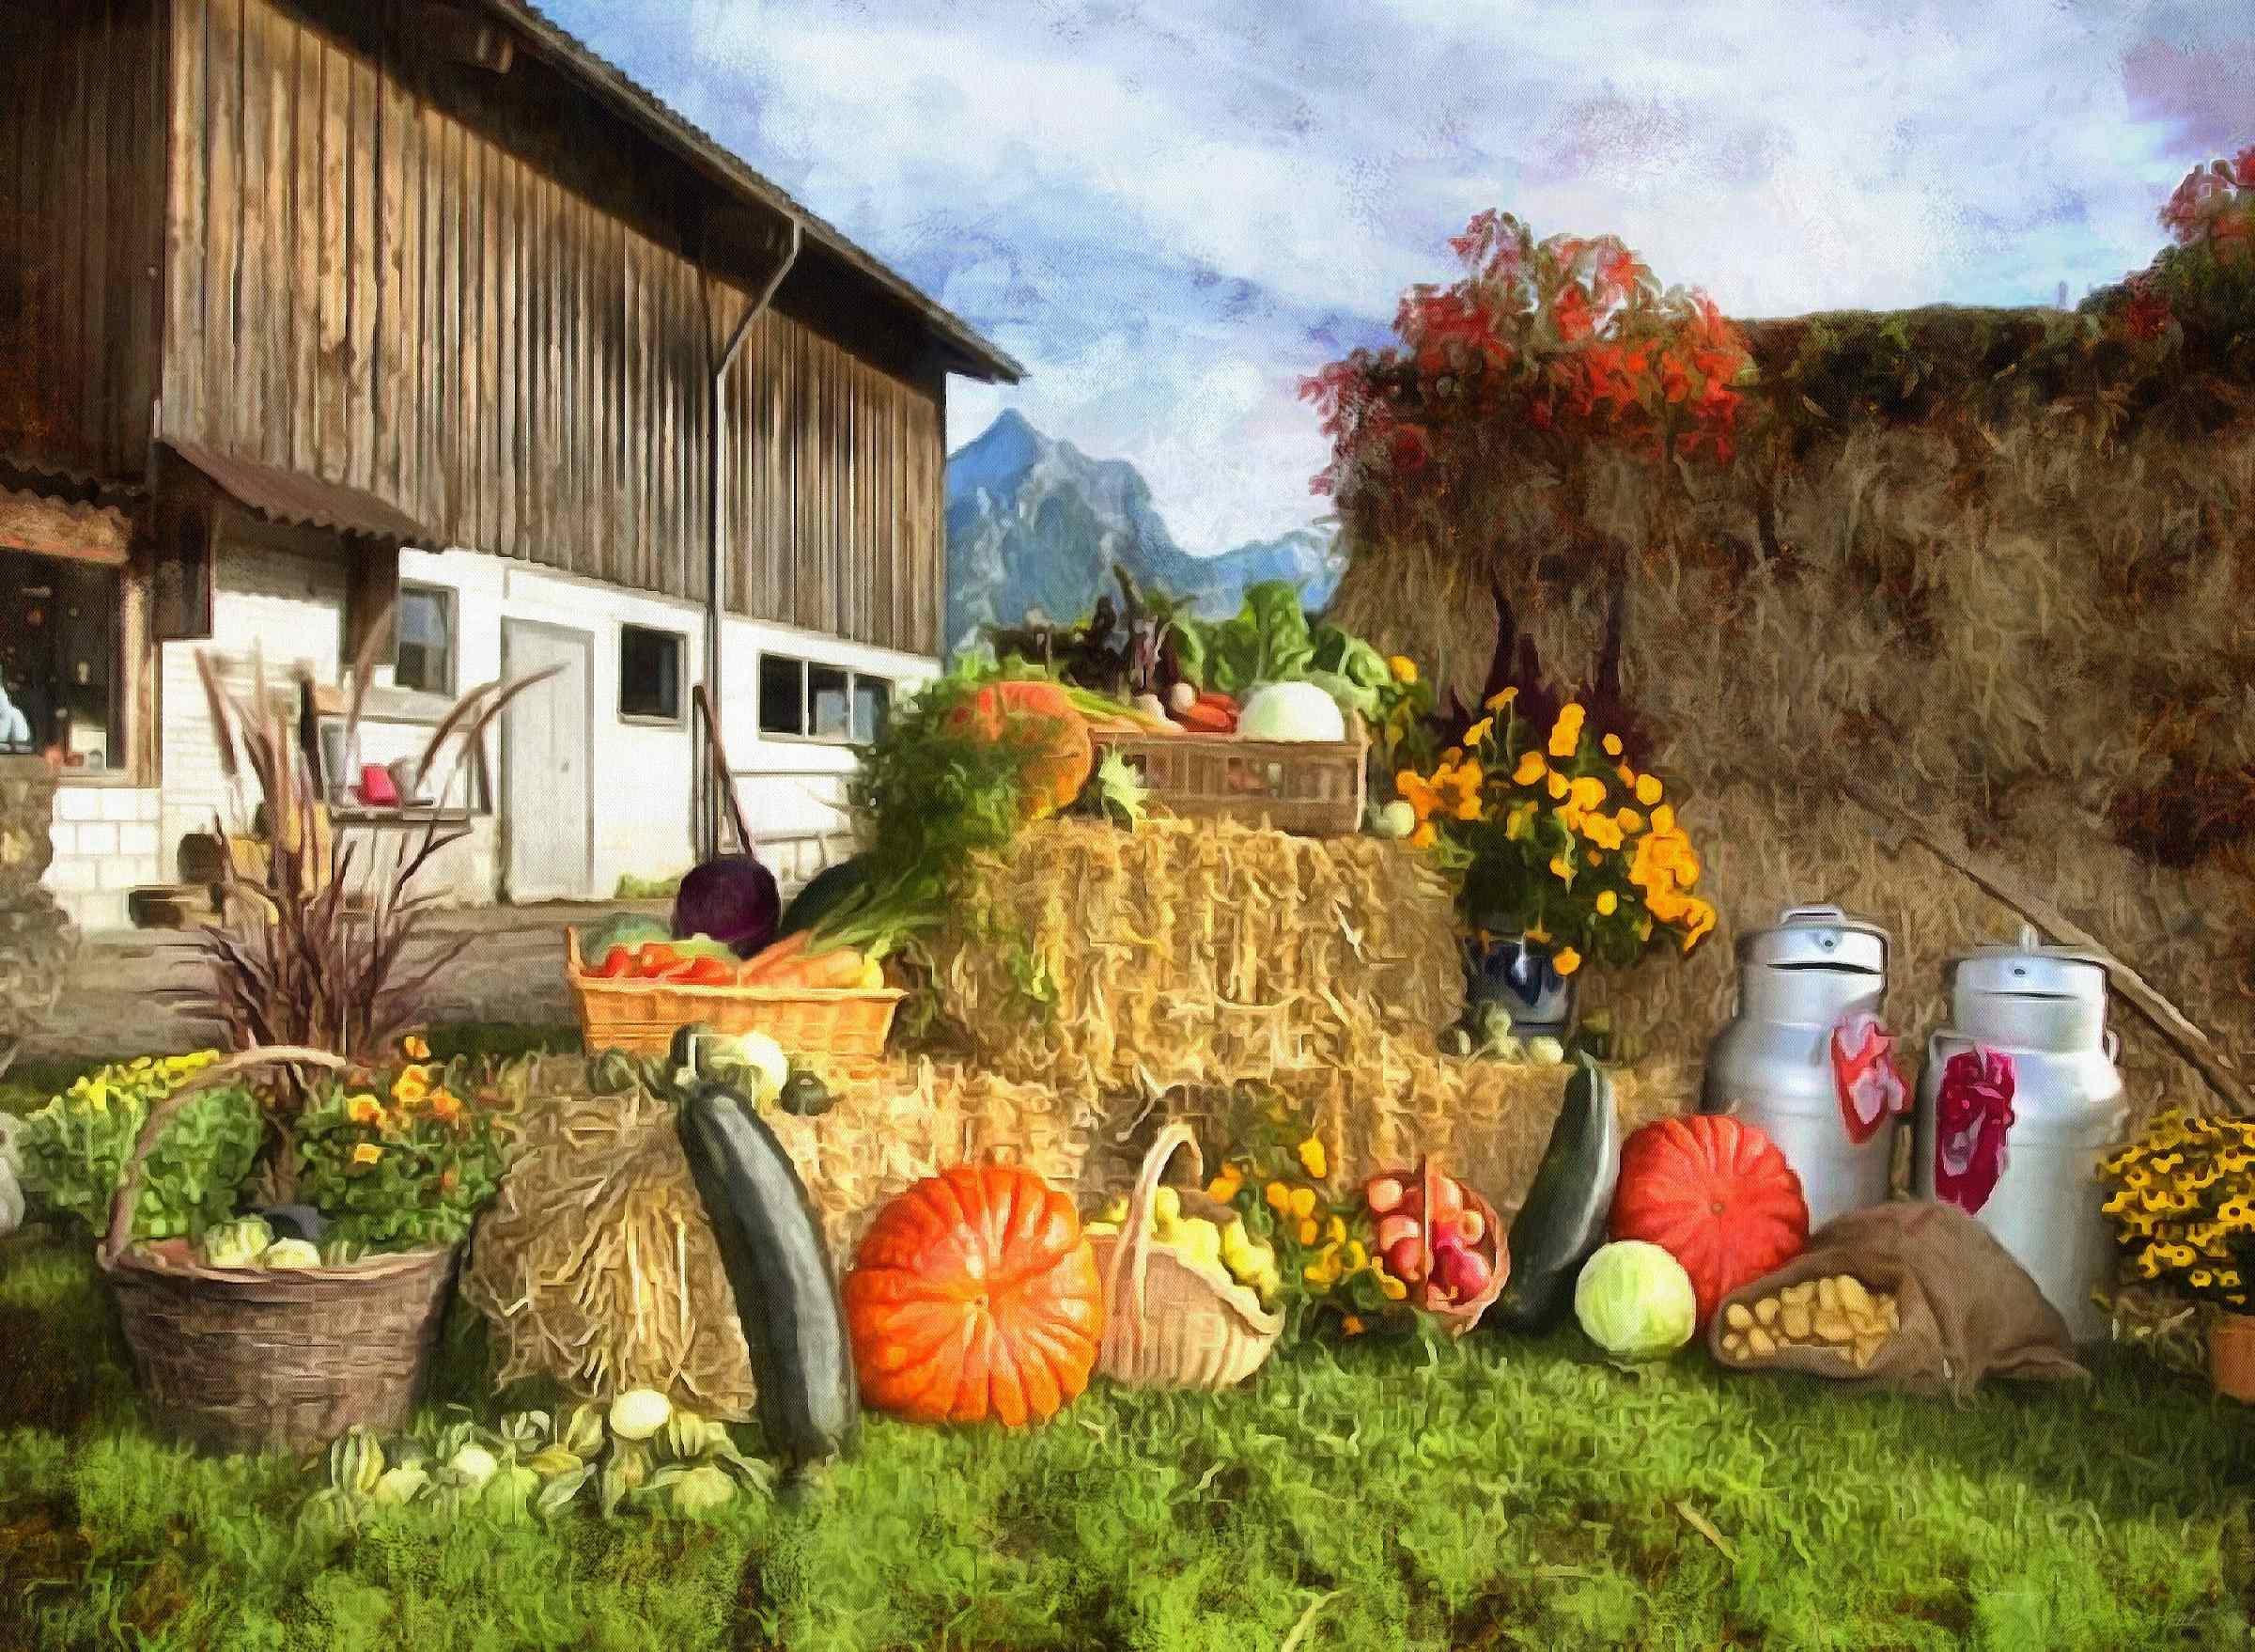 Hd Autumn Desktop Wallpaper Harvest Farm Harvest Plenty Of Vegetables